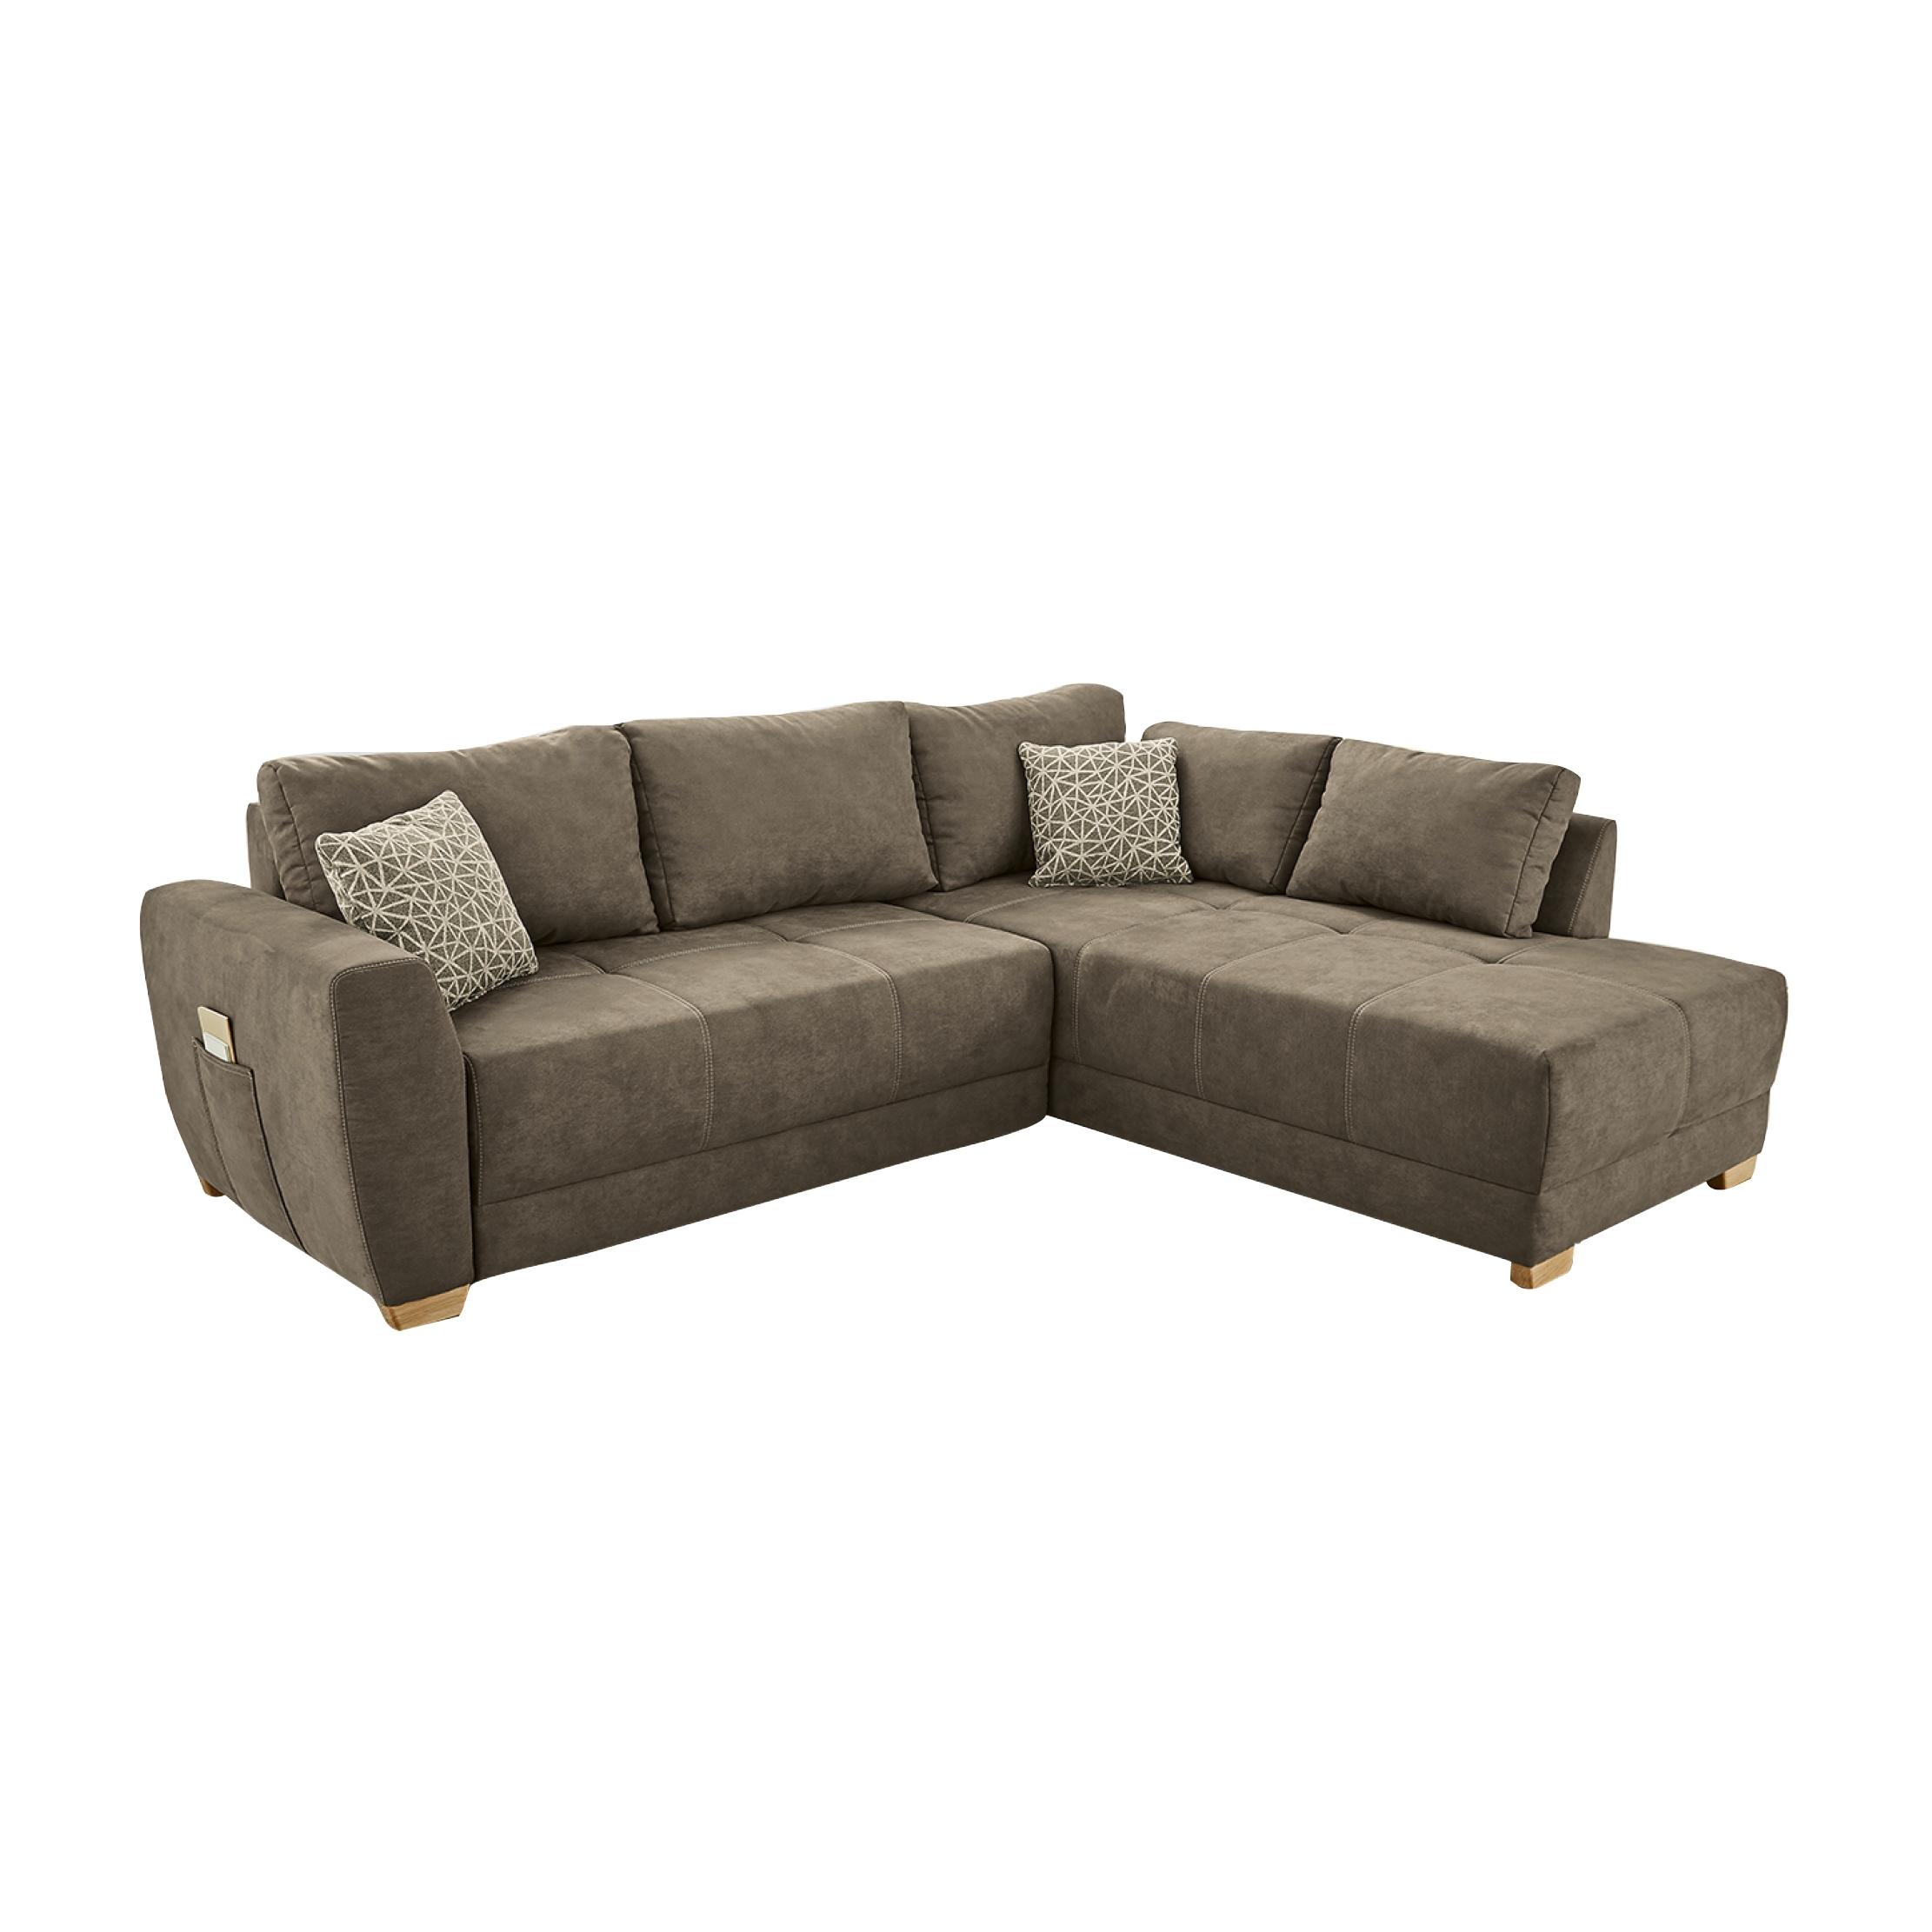 Full Size of Microfaser Sofa Couch Ecksofa Braun Mit Schlaffunktion Ebay Bezug Ektorp Xxl Grau Antik Leder L Big Günstig 3er Ligne Roset Form Breit Le Corbusier Hannover Sofa Microfaser Sofa